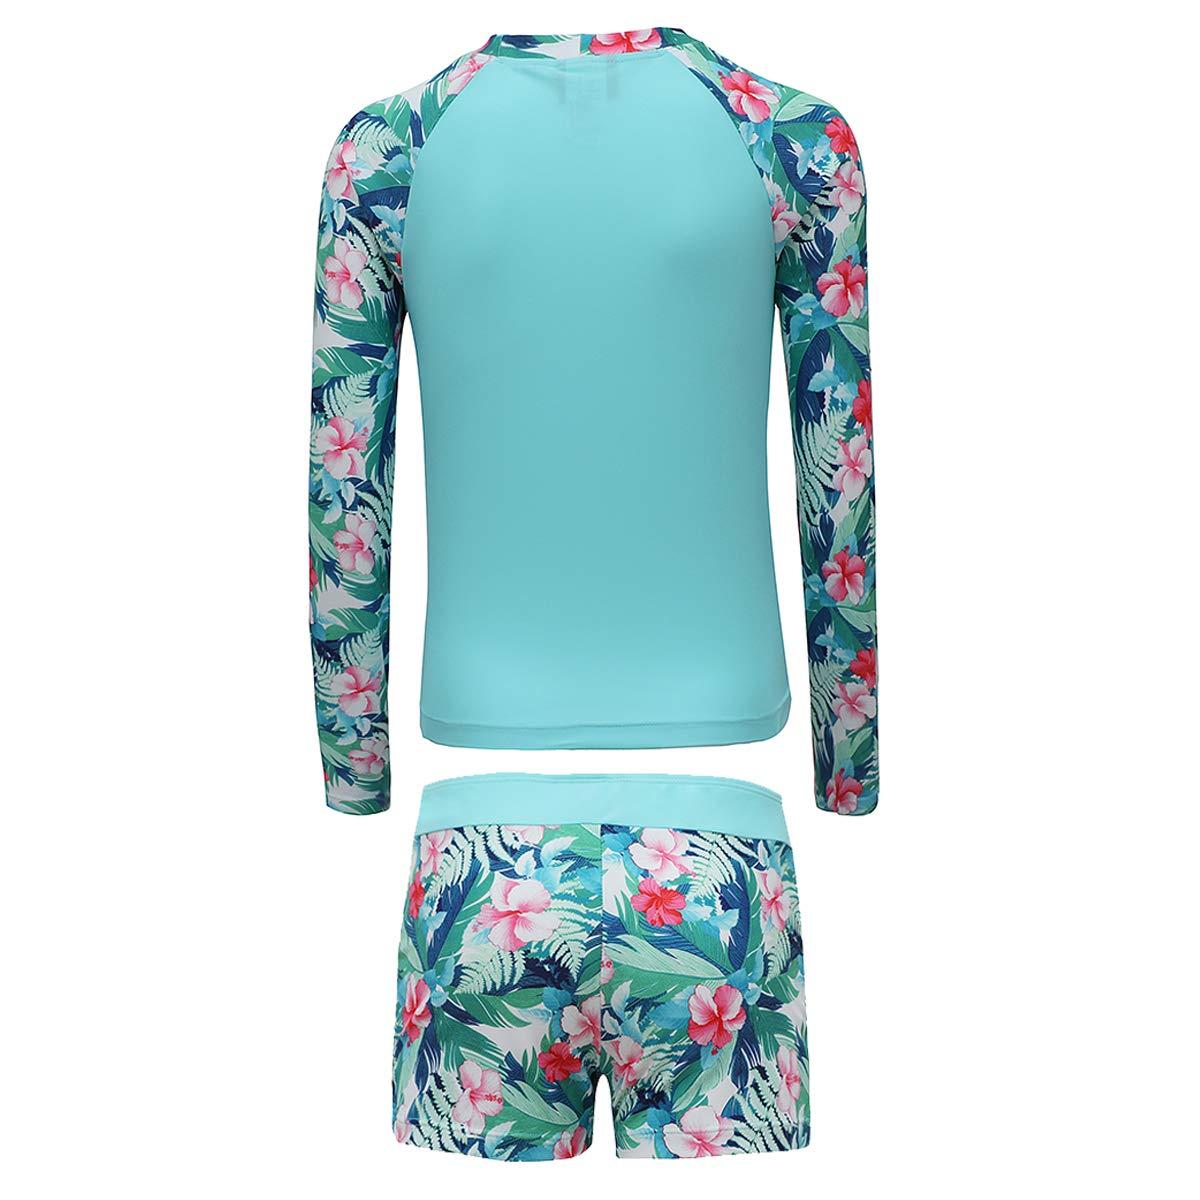 5e8bf75c6b Amazon.com: PHIBEE Girls' Rash Guard Set Long Sleeve UPF 50+ Sun Protection  Two-Piece Swimwear: Clothing